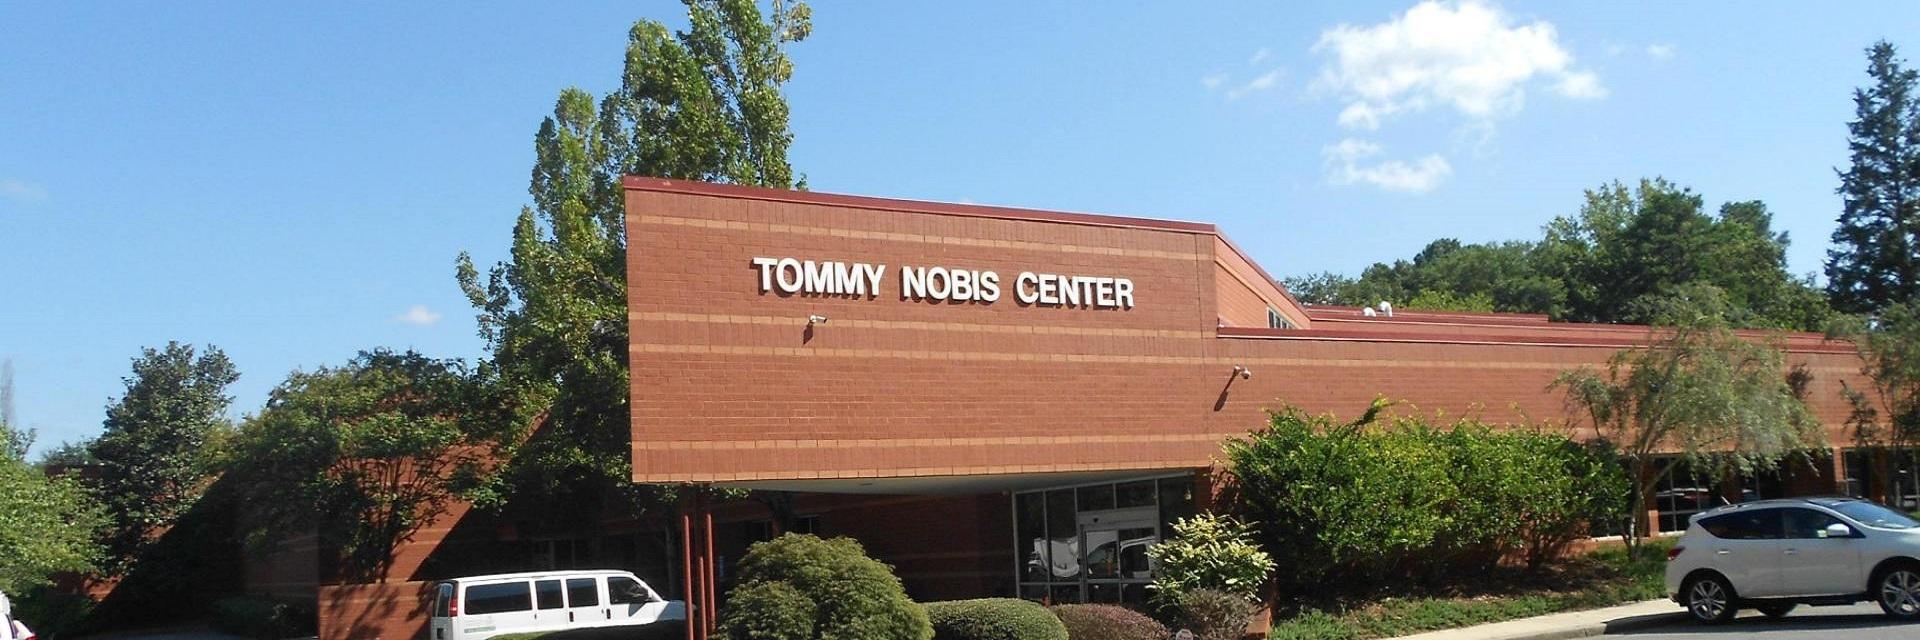 Tommy Nobis Center photo 1